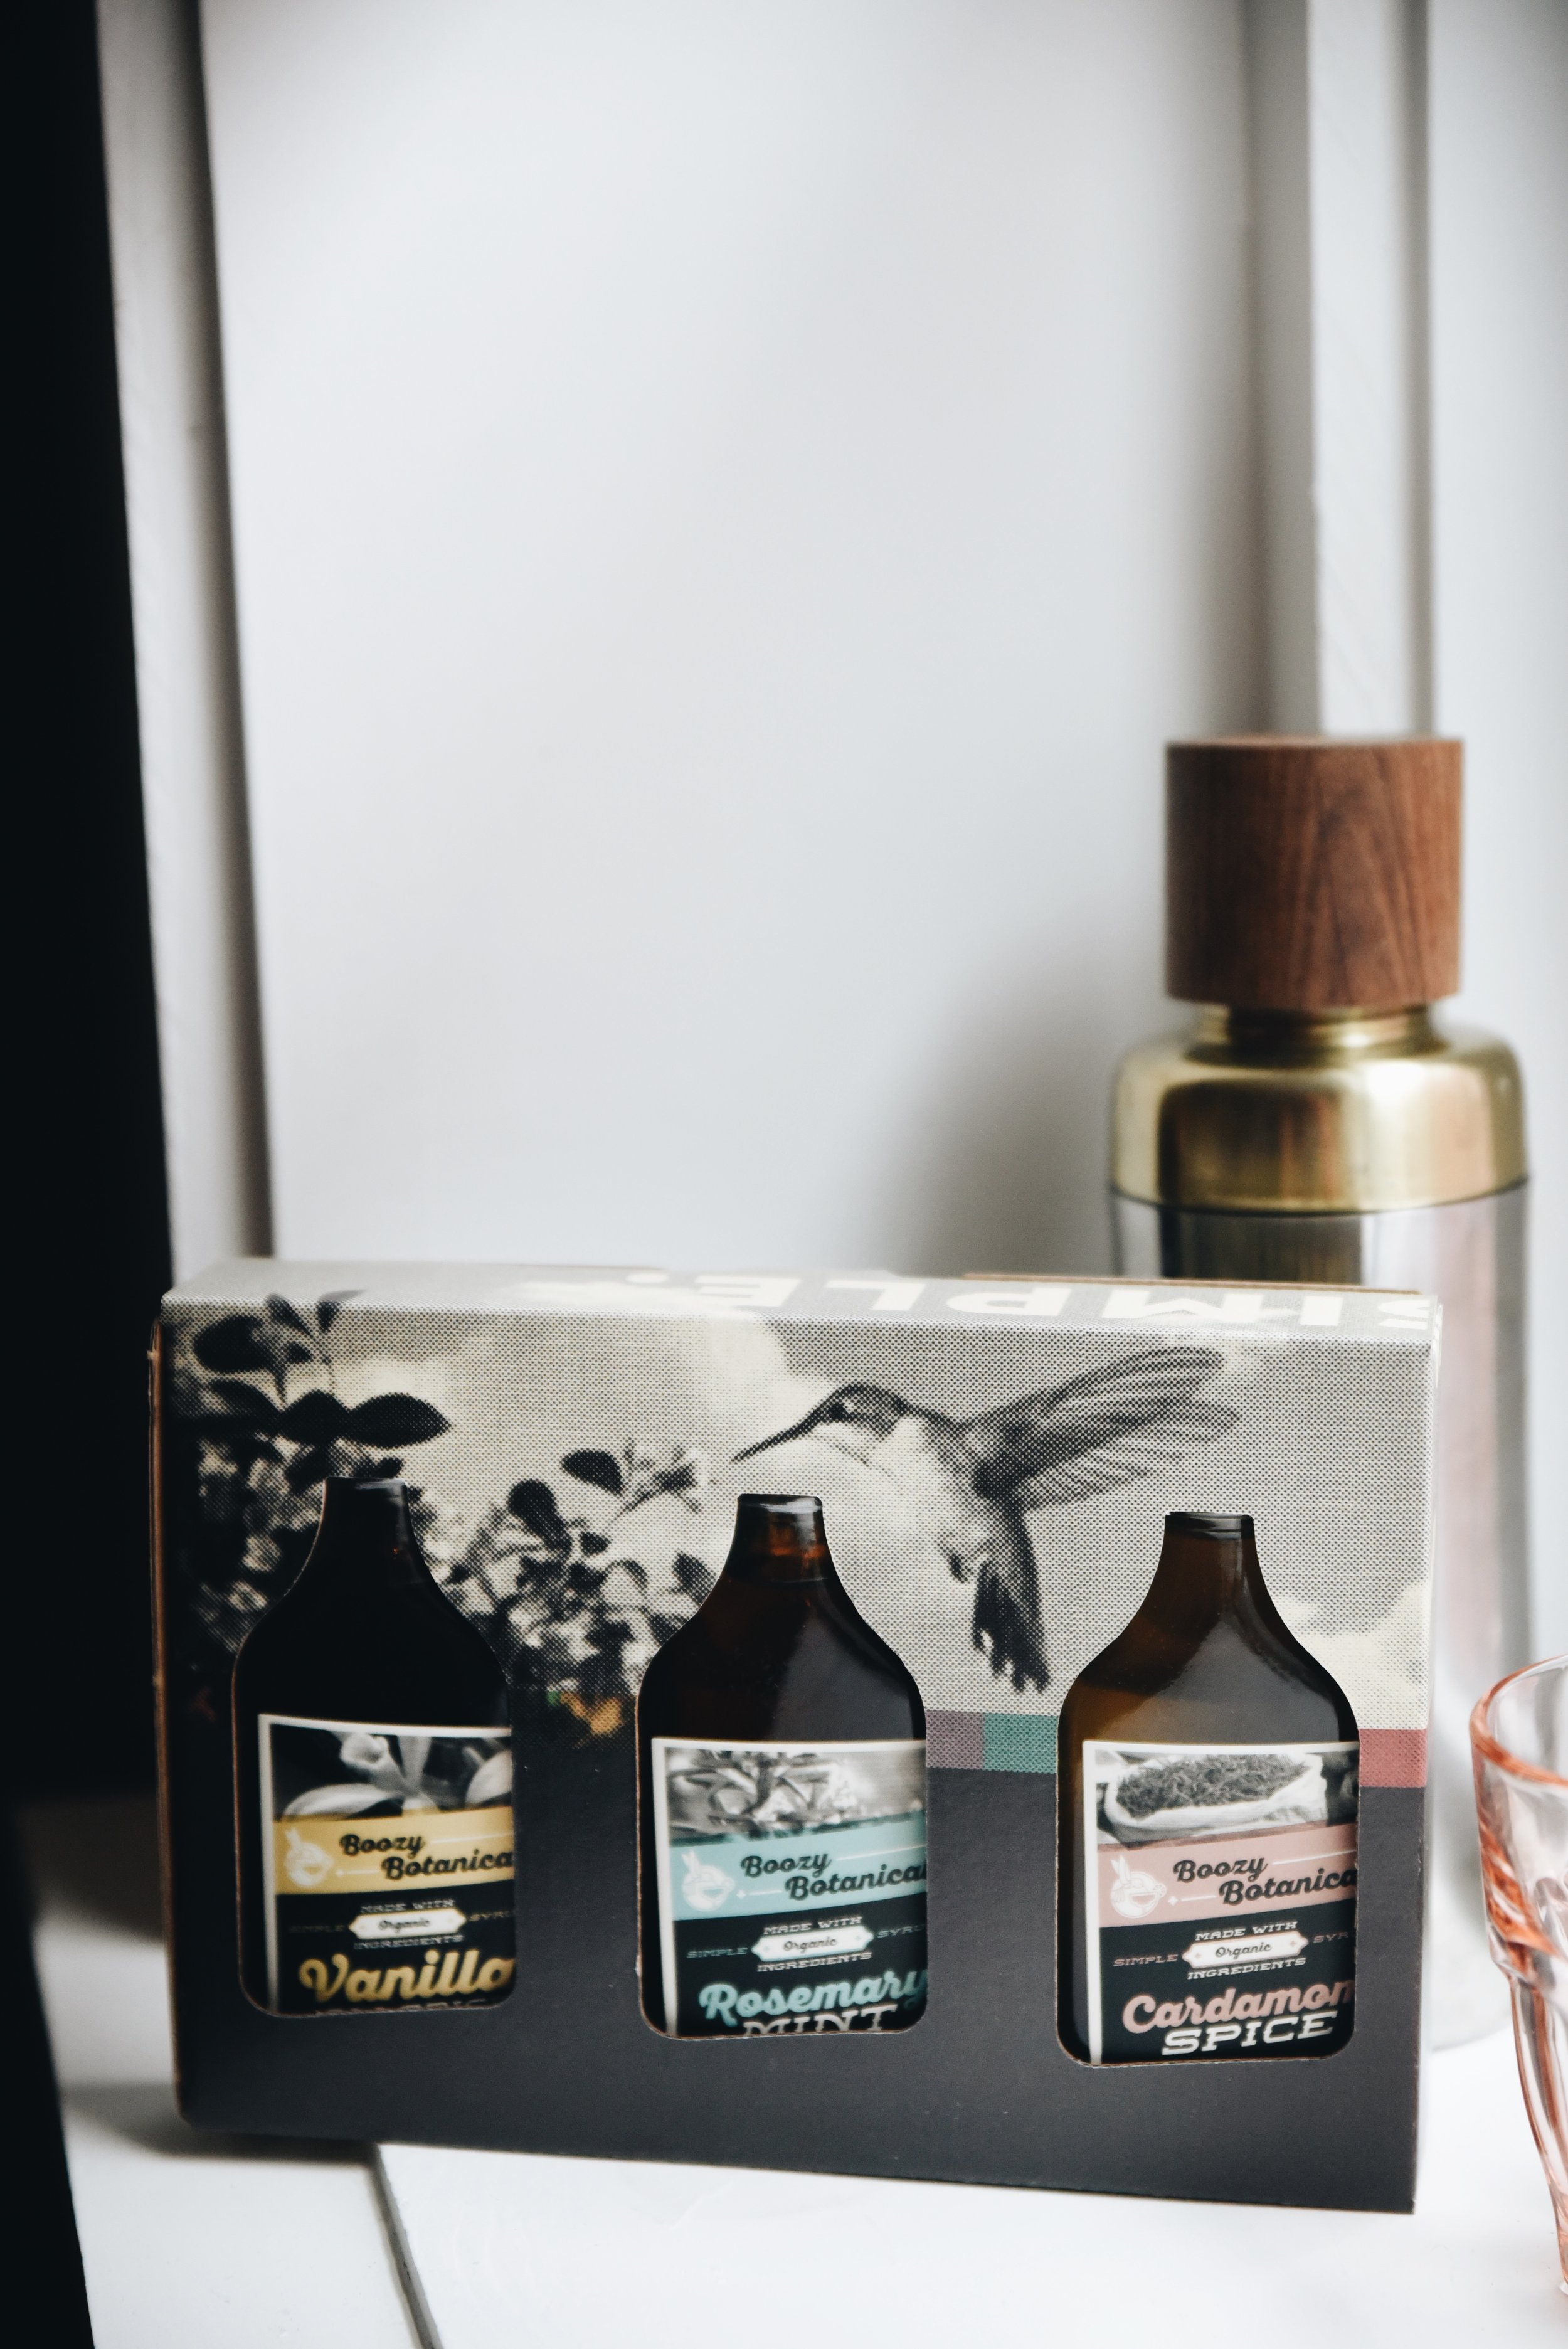 Boozy Botanicals gift set.